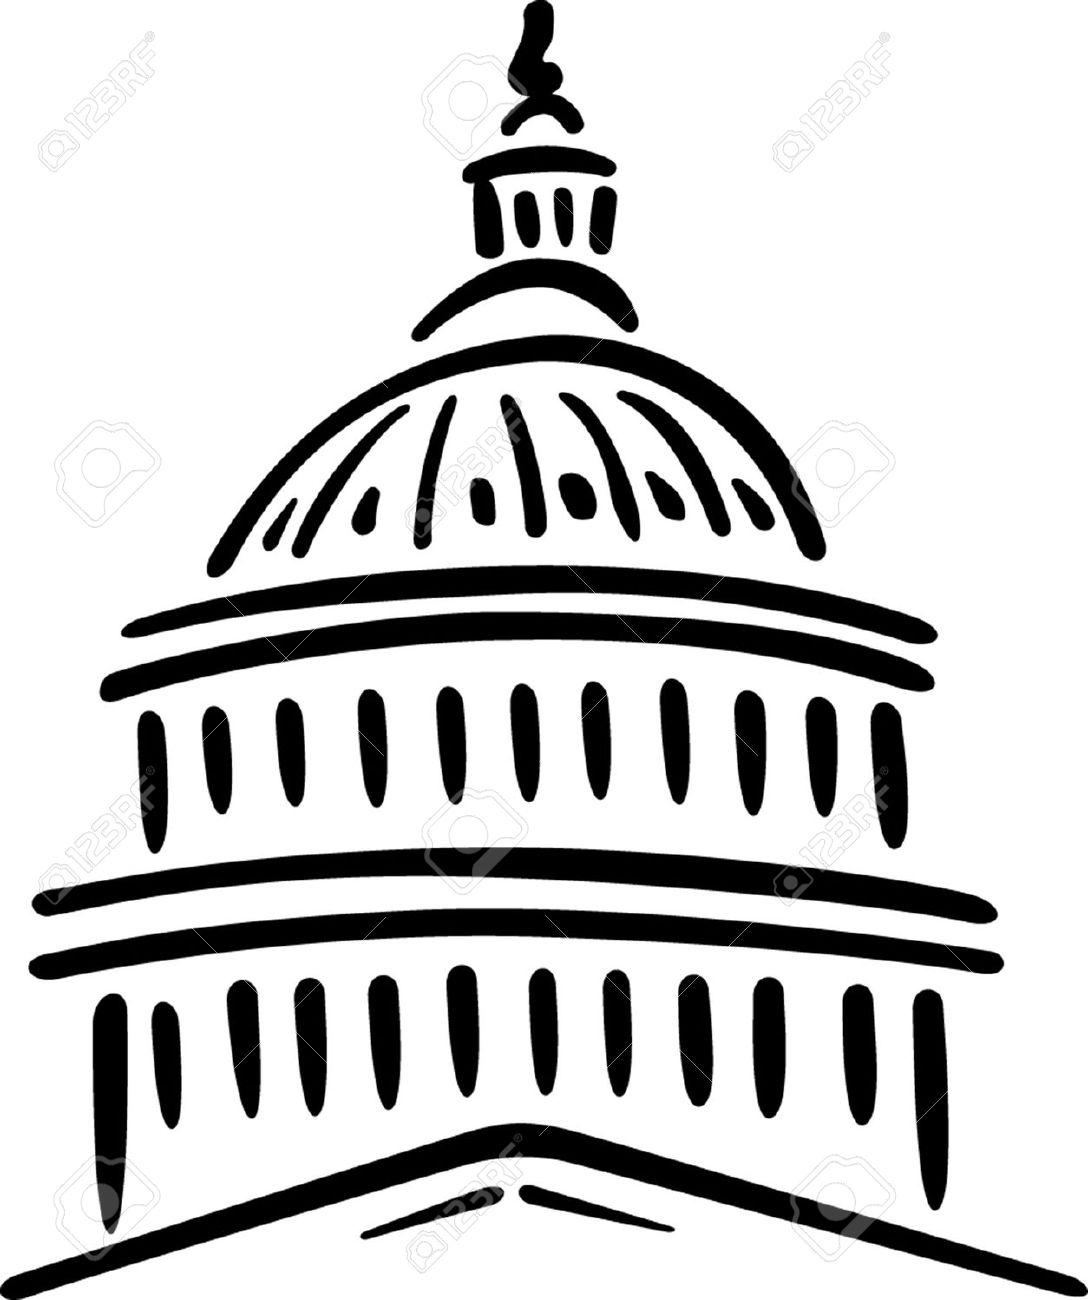 Capitol building dome clipart.